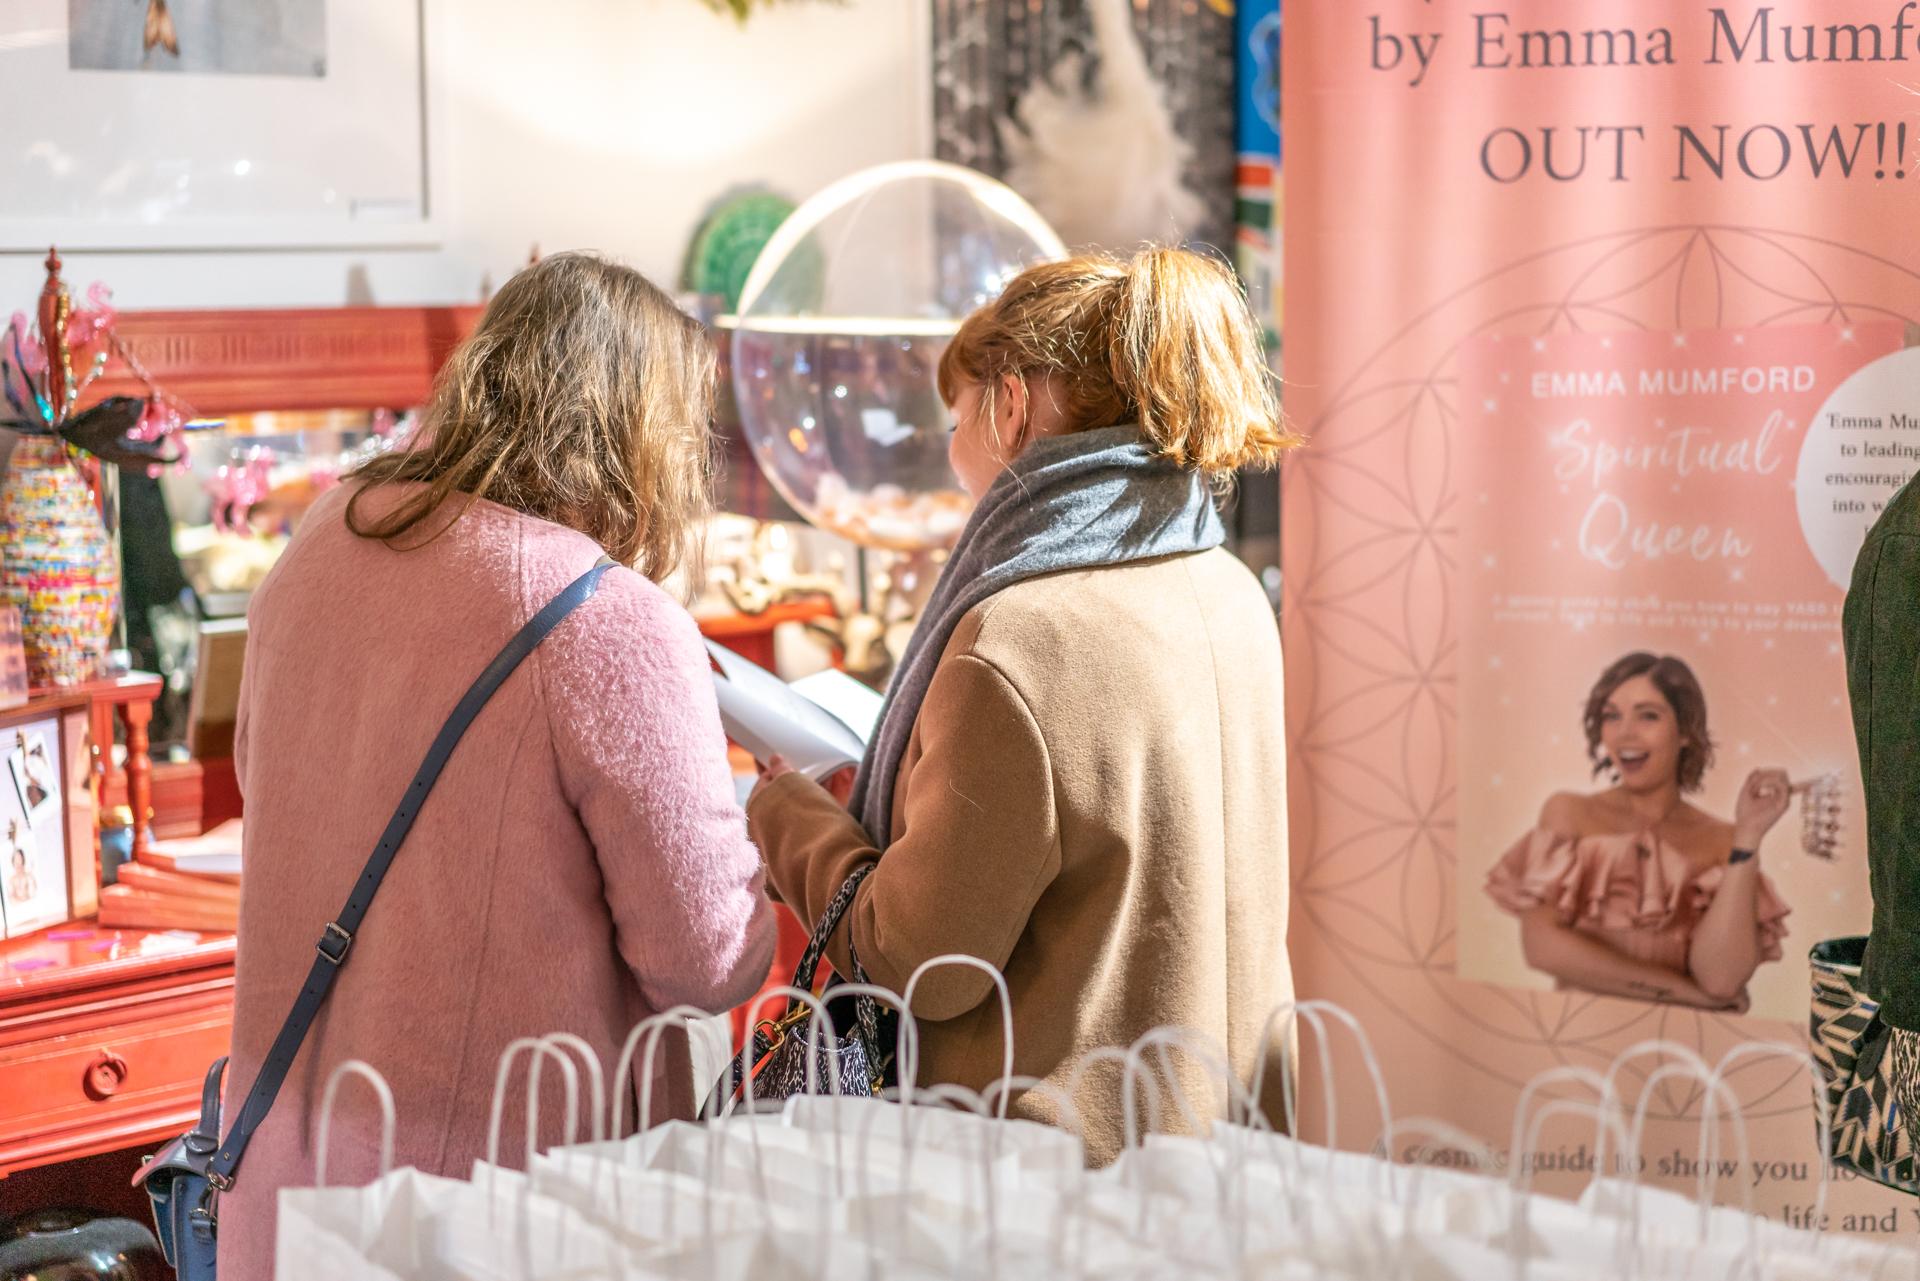 Spiritual Queen Book Launch Party - Emma Mumford